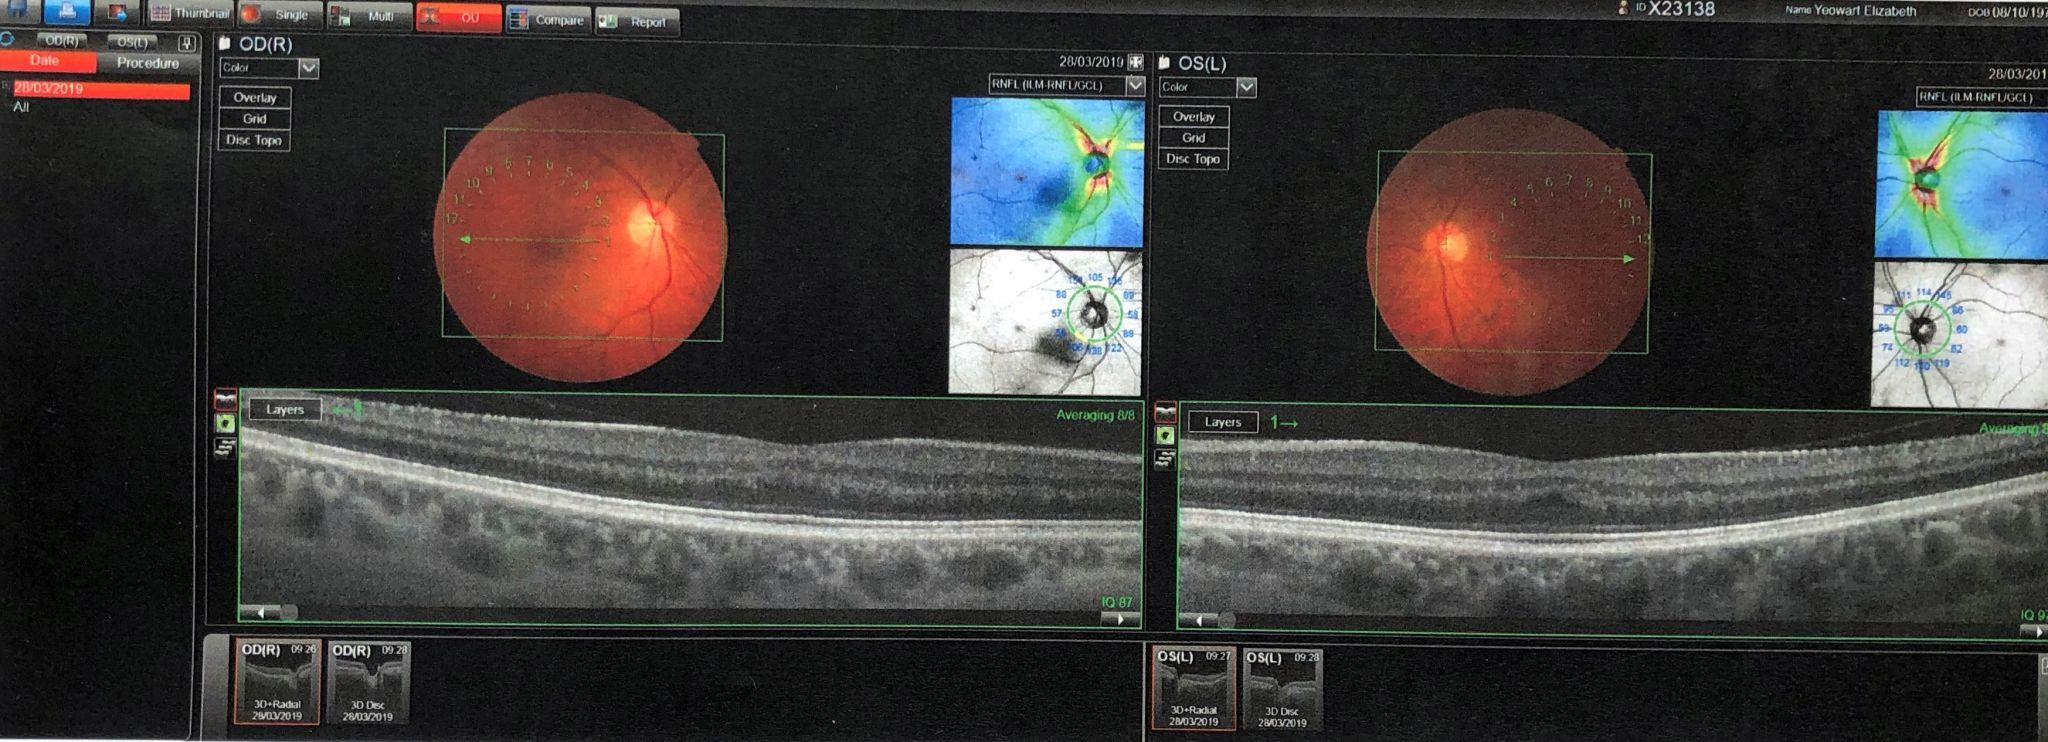 optical equipment used in eye examination